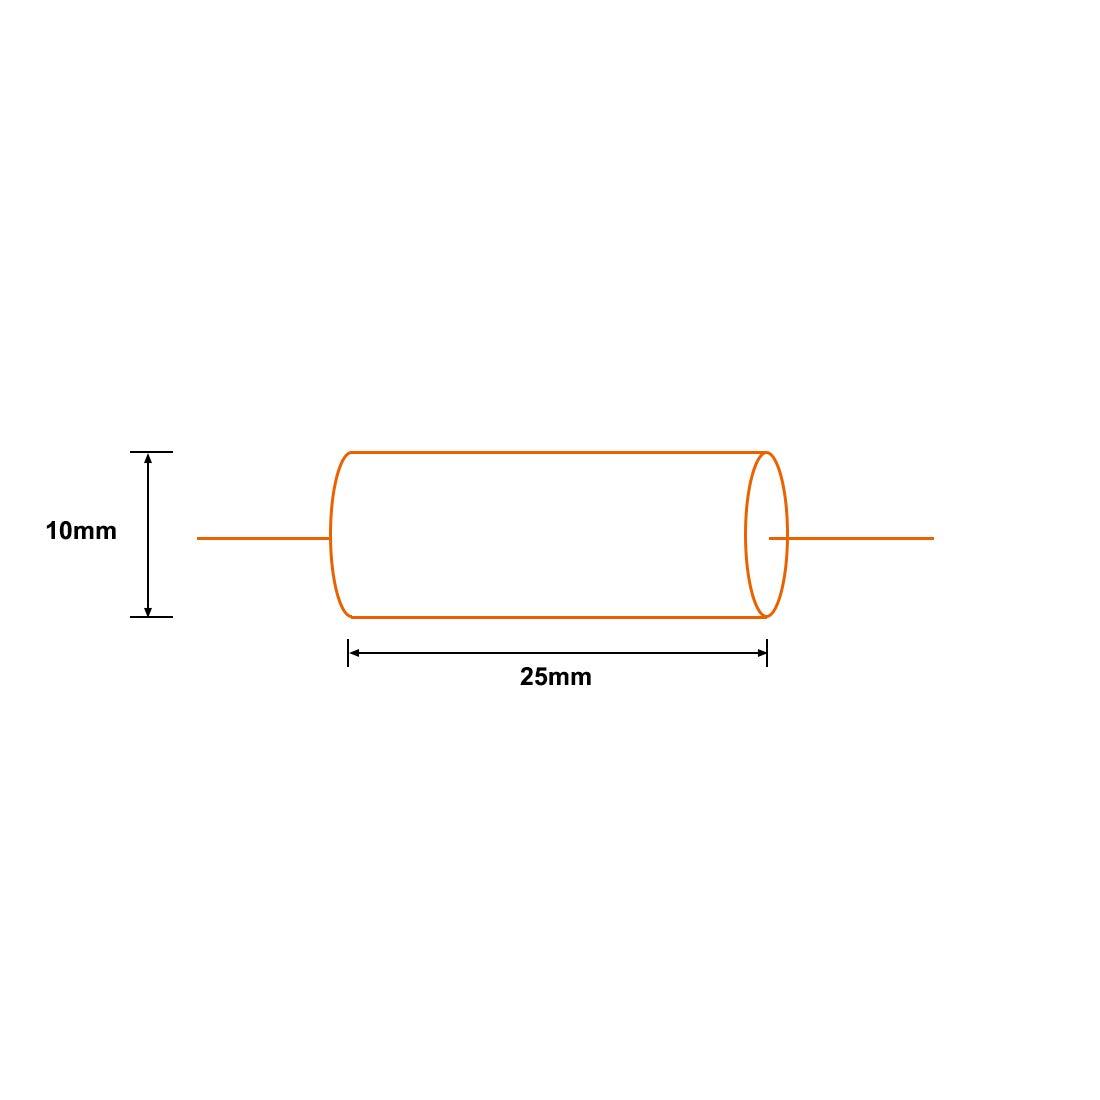 sourcing map Condensador De Pel/ícula Redonda 3.3Uf 250V DC Axiales Condensadores De Pel/ícula De Poli/éster Amarillo Divisor De Audio